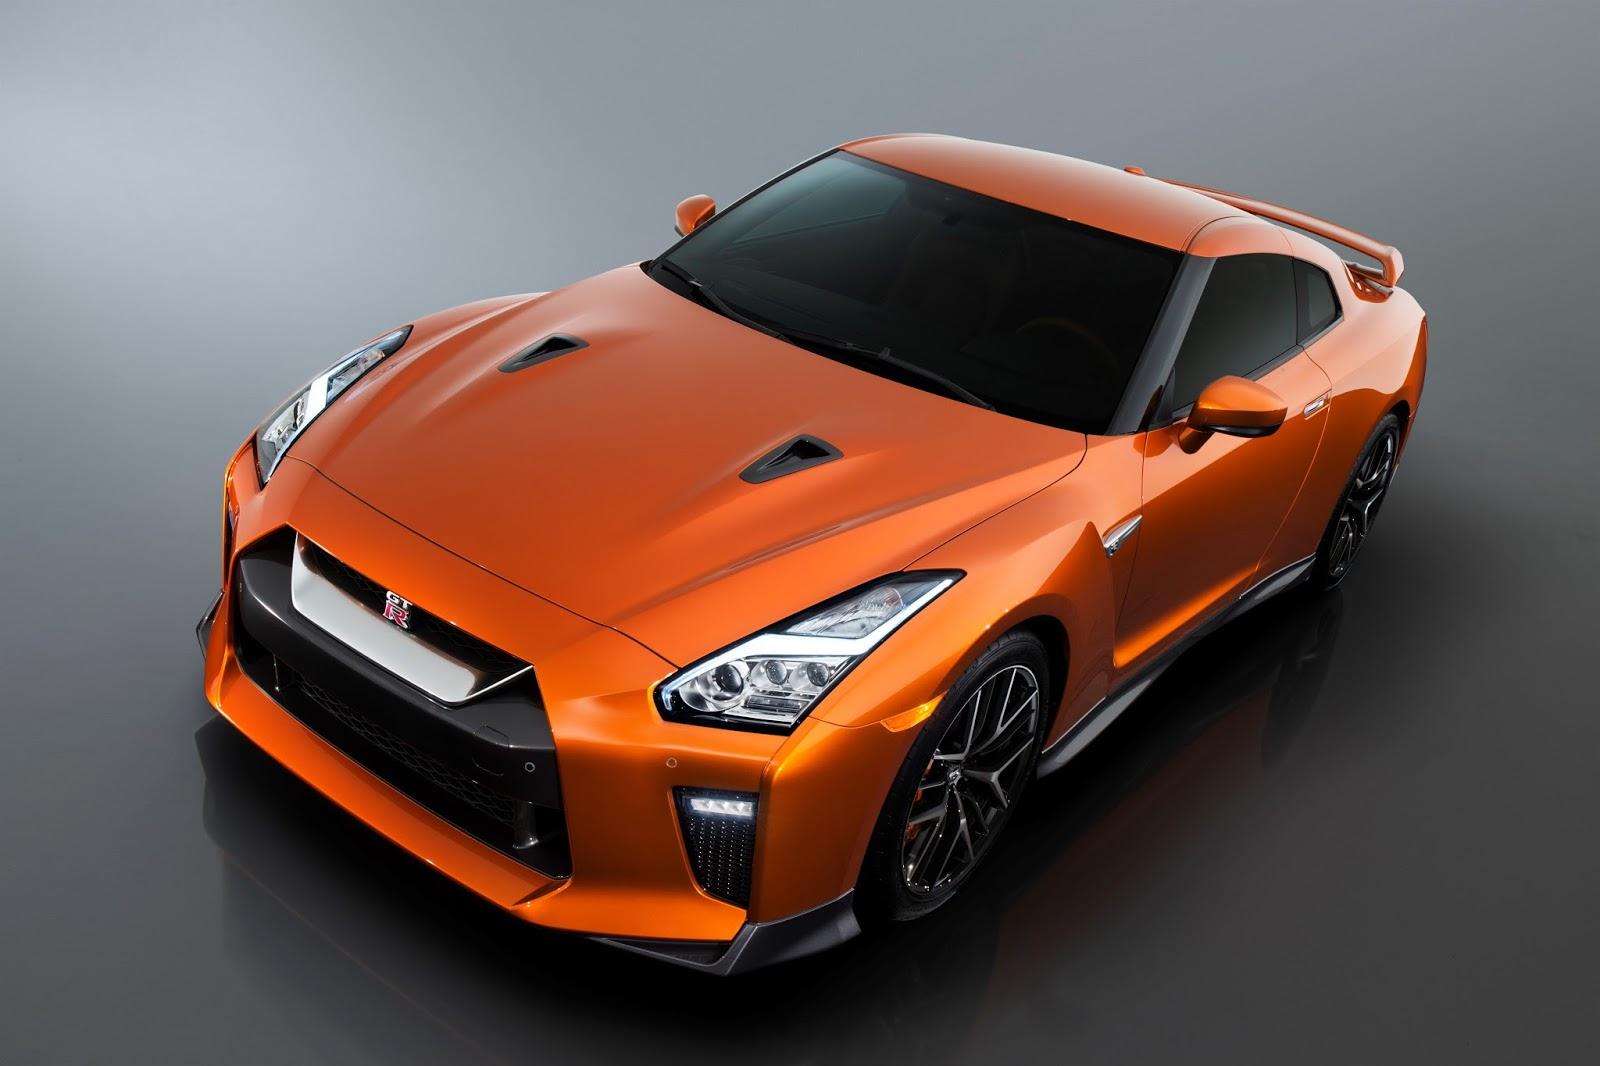 144070 1 5 Nissan GT-R: Ο Godzilla επέστρεψε! Godzilla, Nissan, Nissan GT-R, supercars, έκθεση Νέας Υόρκης